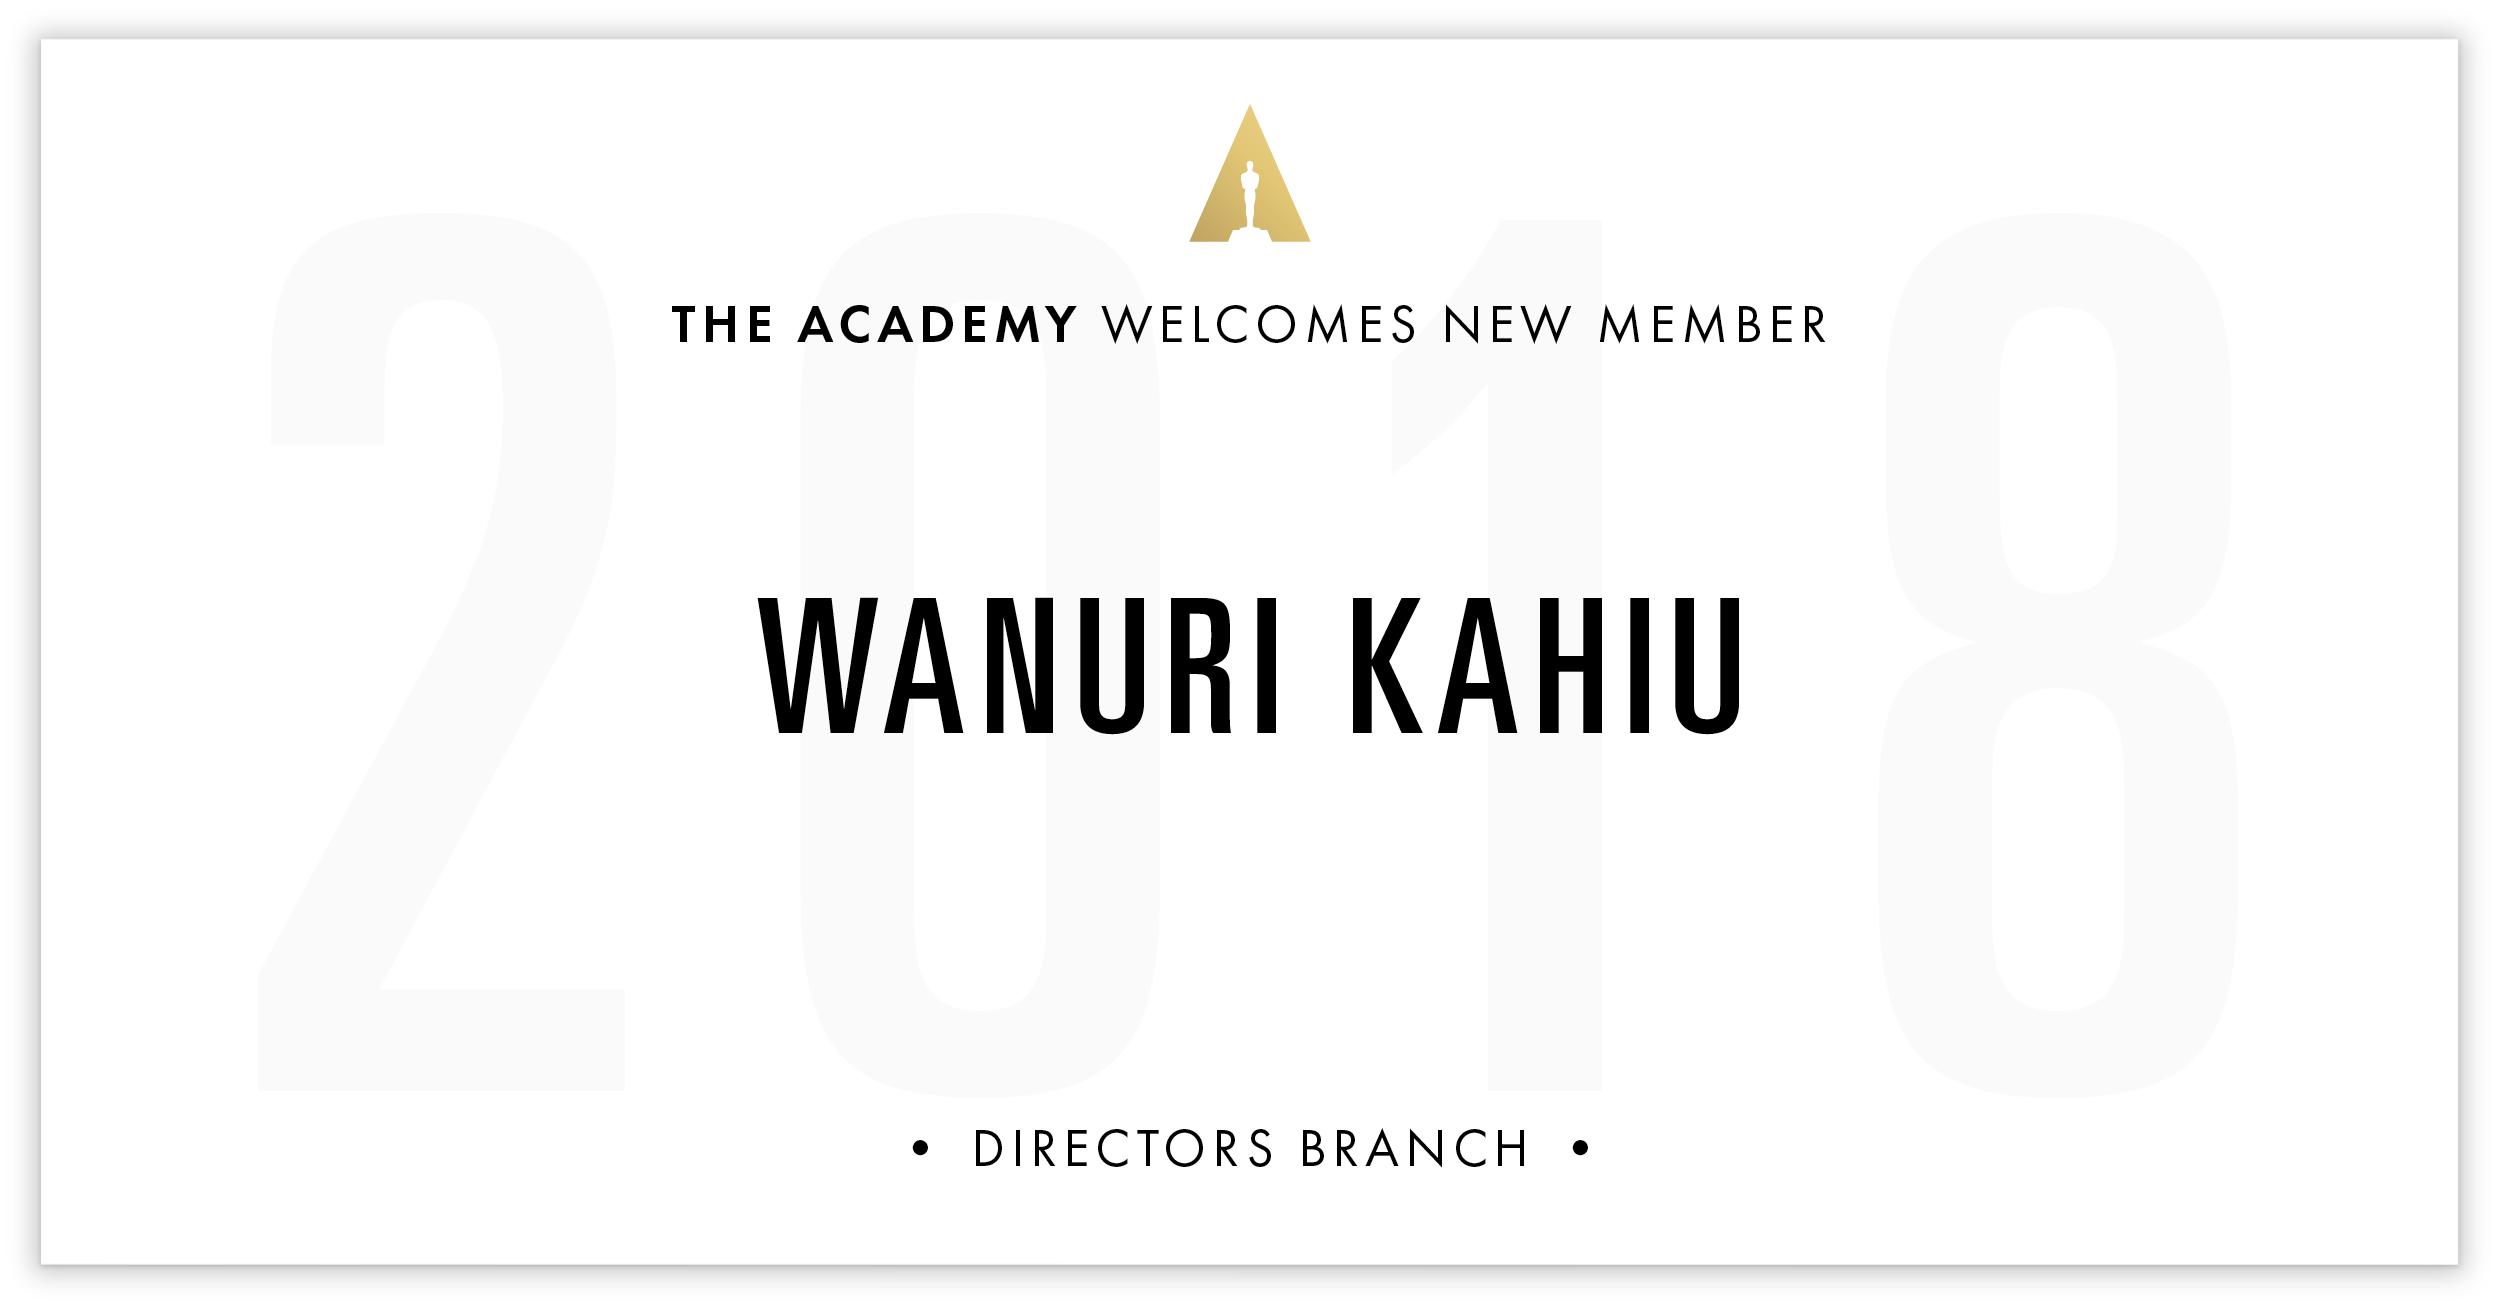 Wanuri Kahiu is invited!